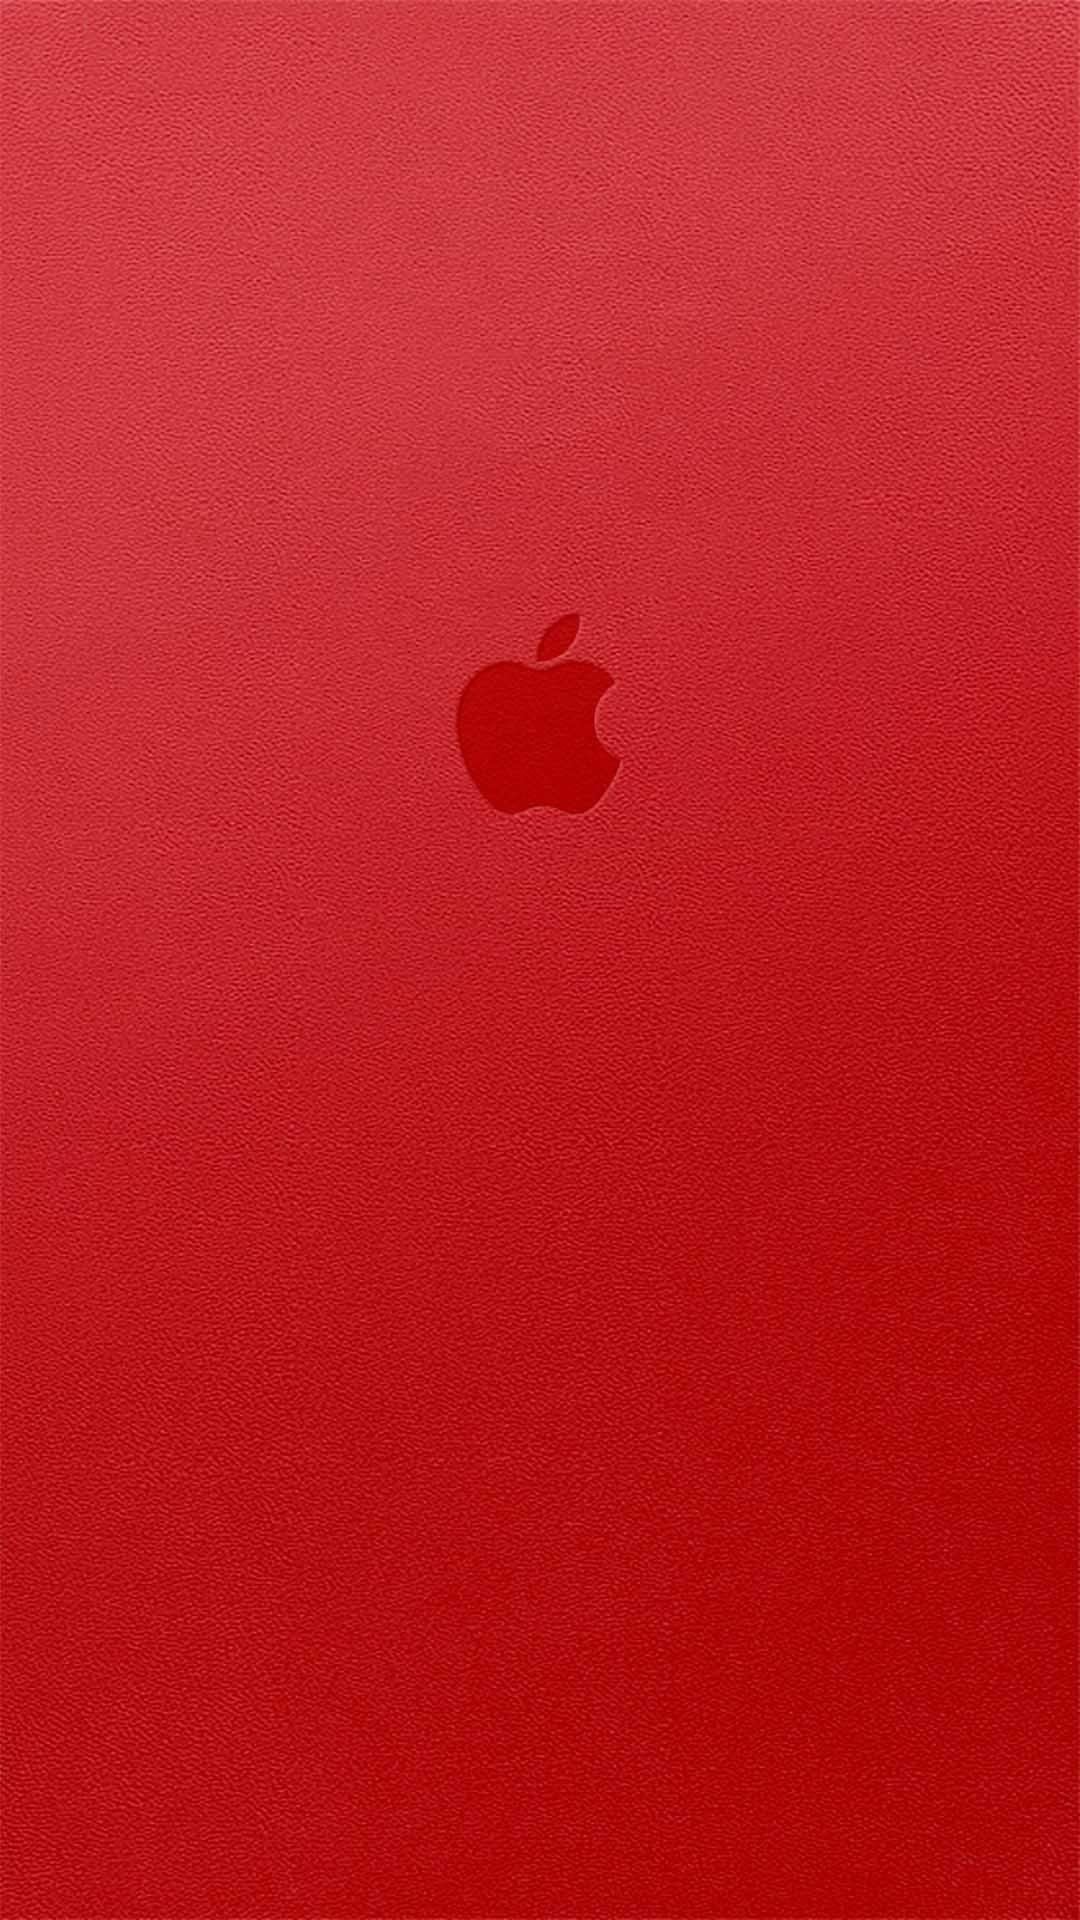 Red ピンク 壁紙 Iphone 壁紙 Apple ロゴ